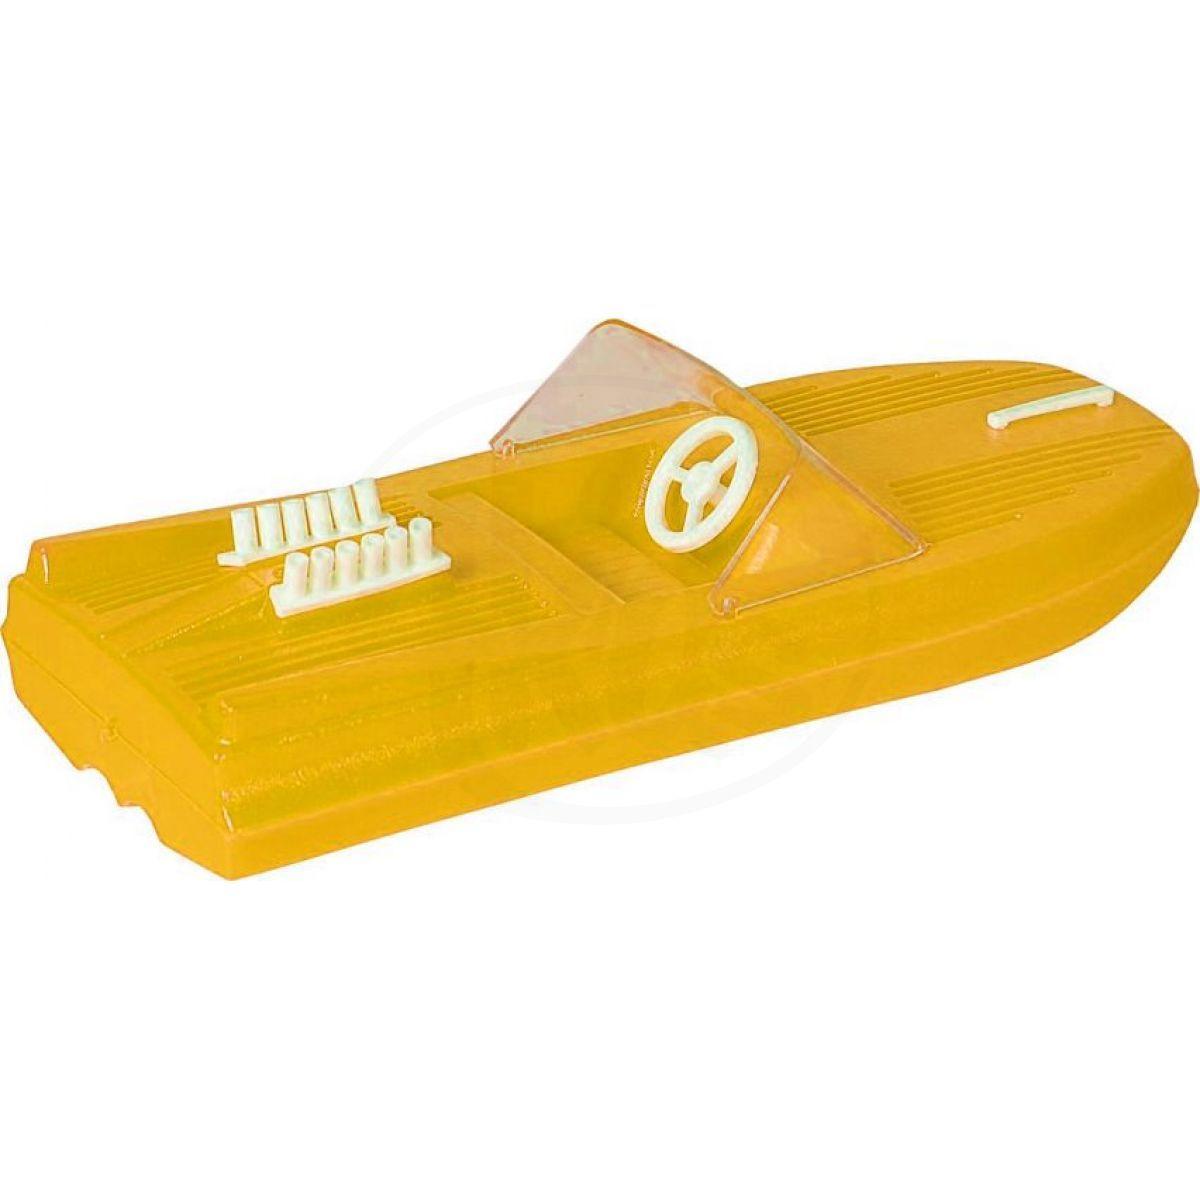 Směr Motorový člun 25 cm žlutý